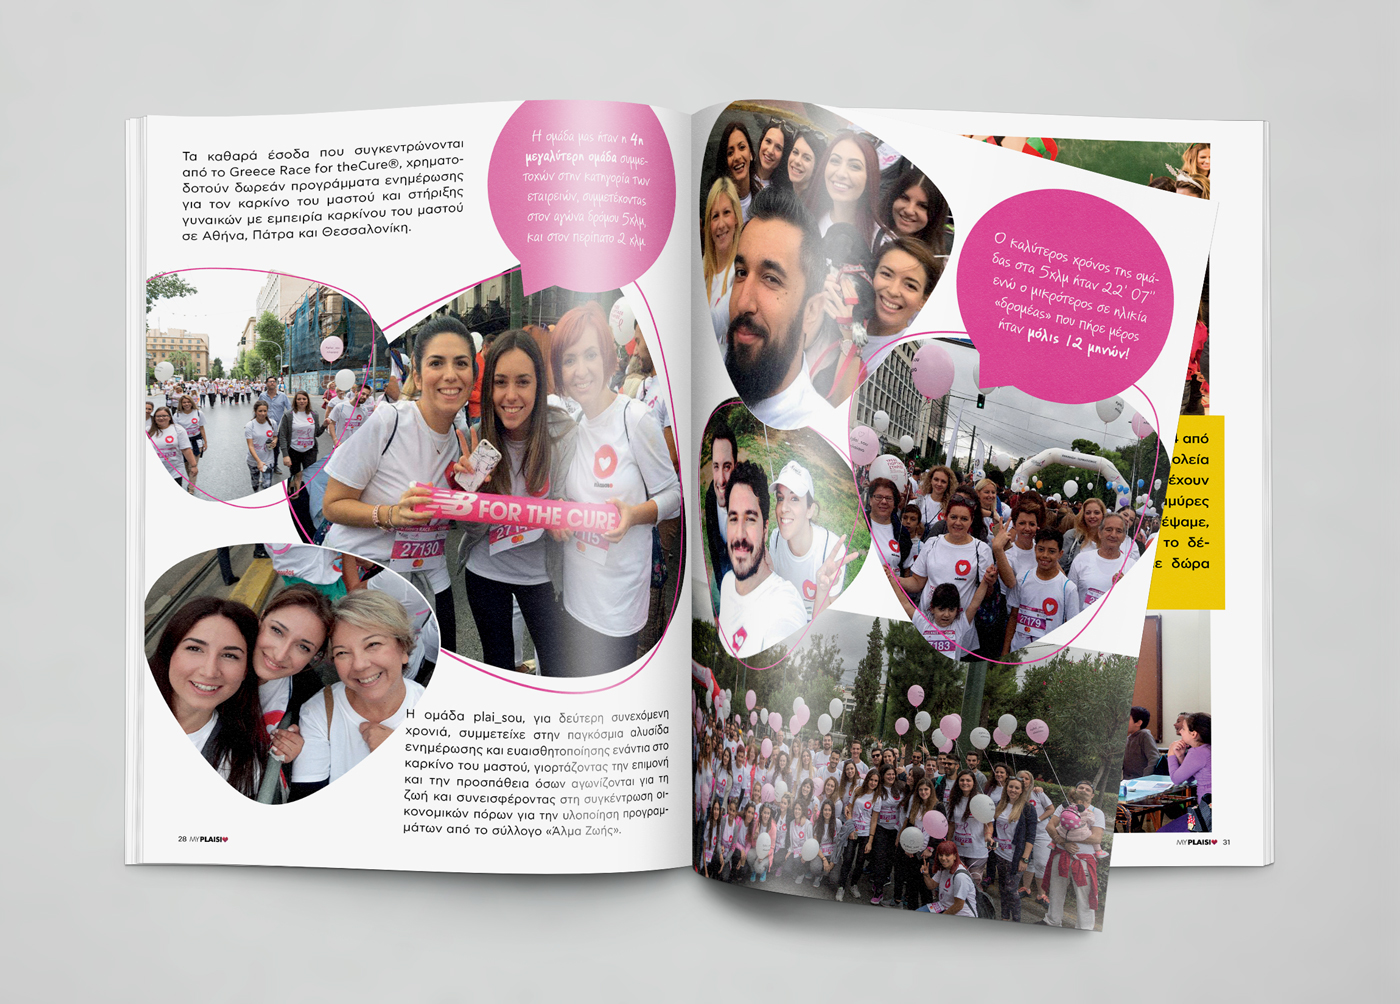 plaisio magazine